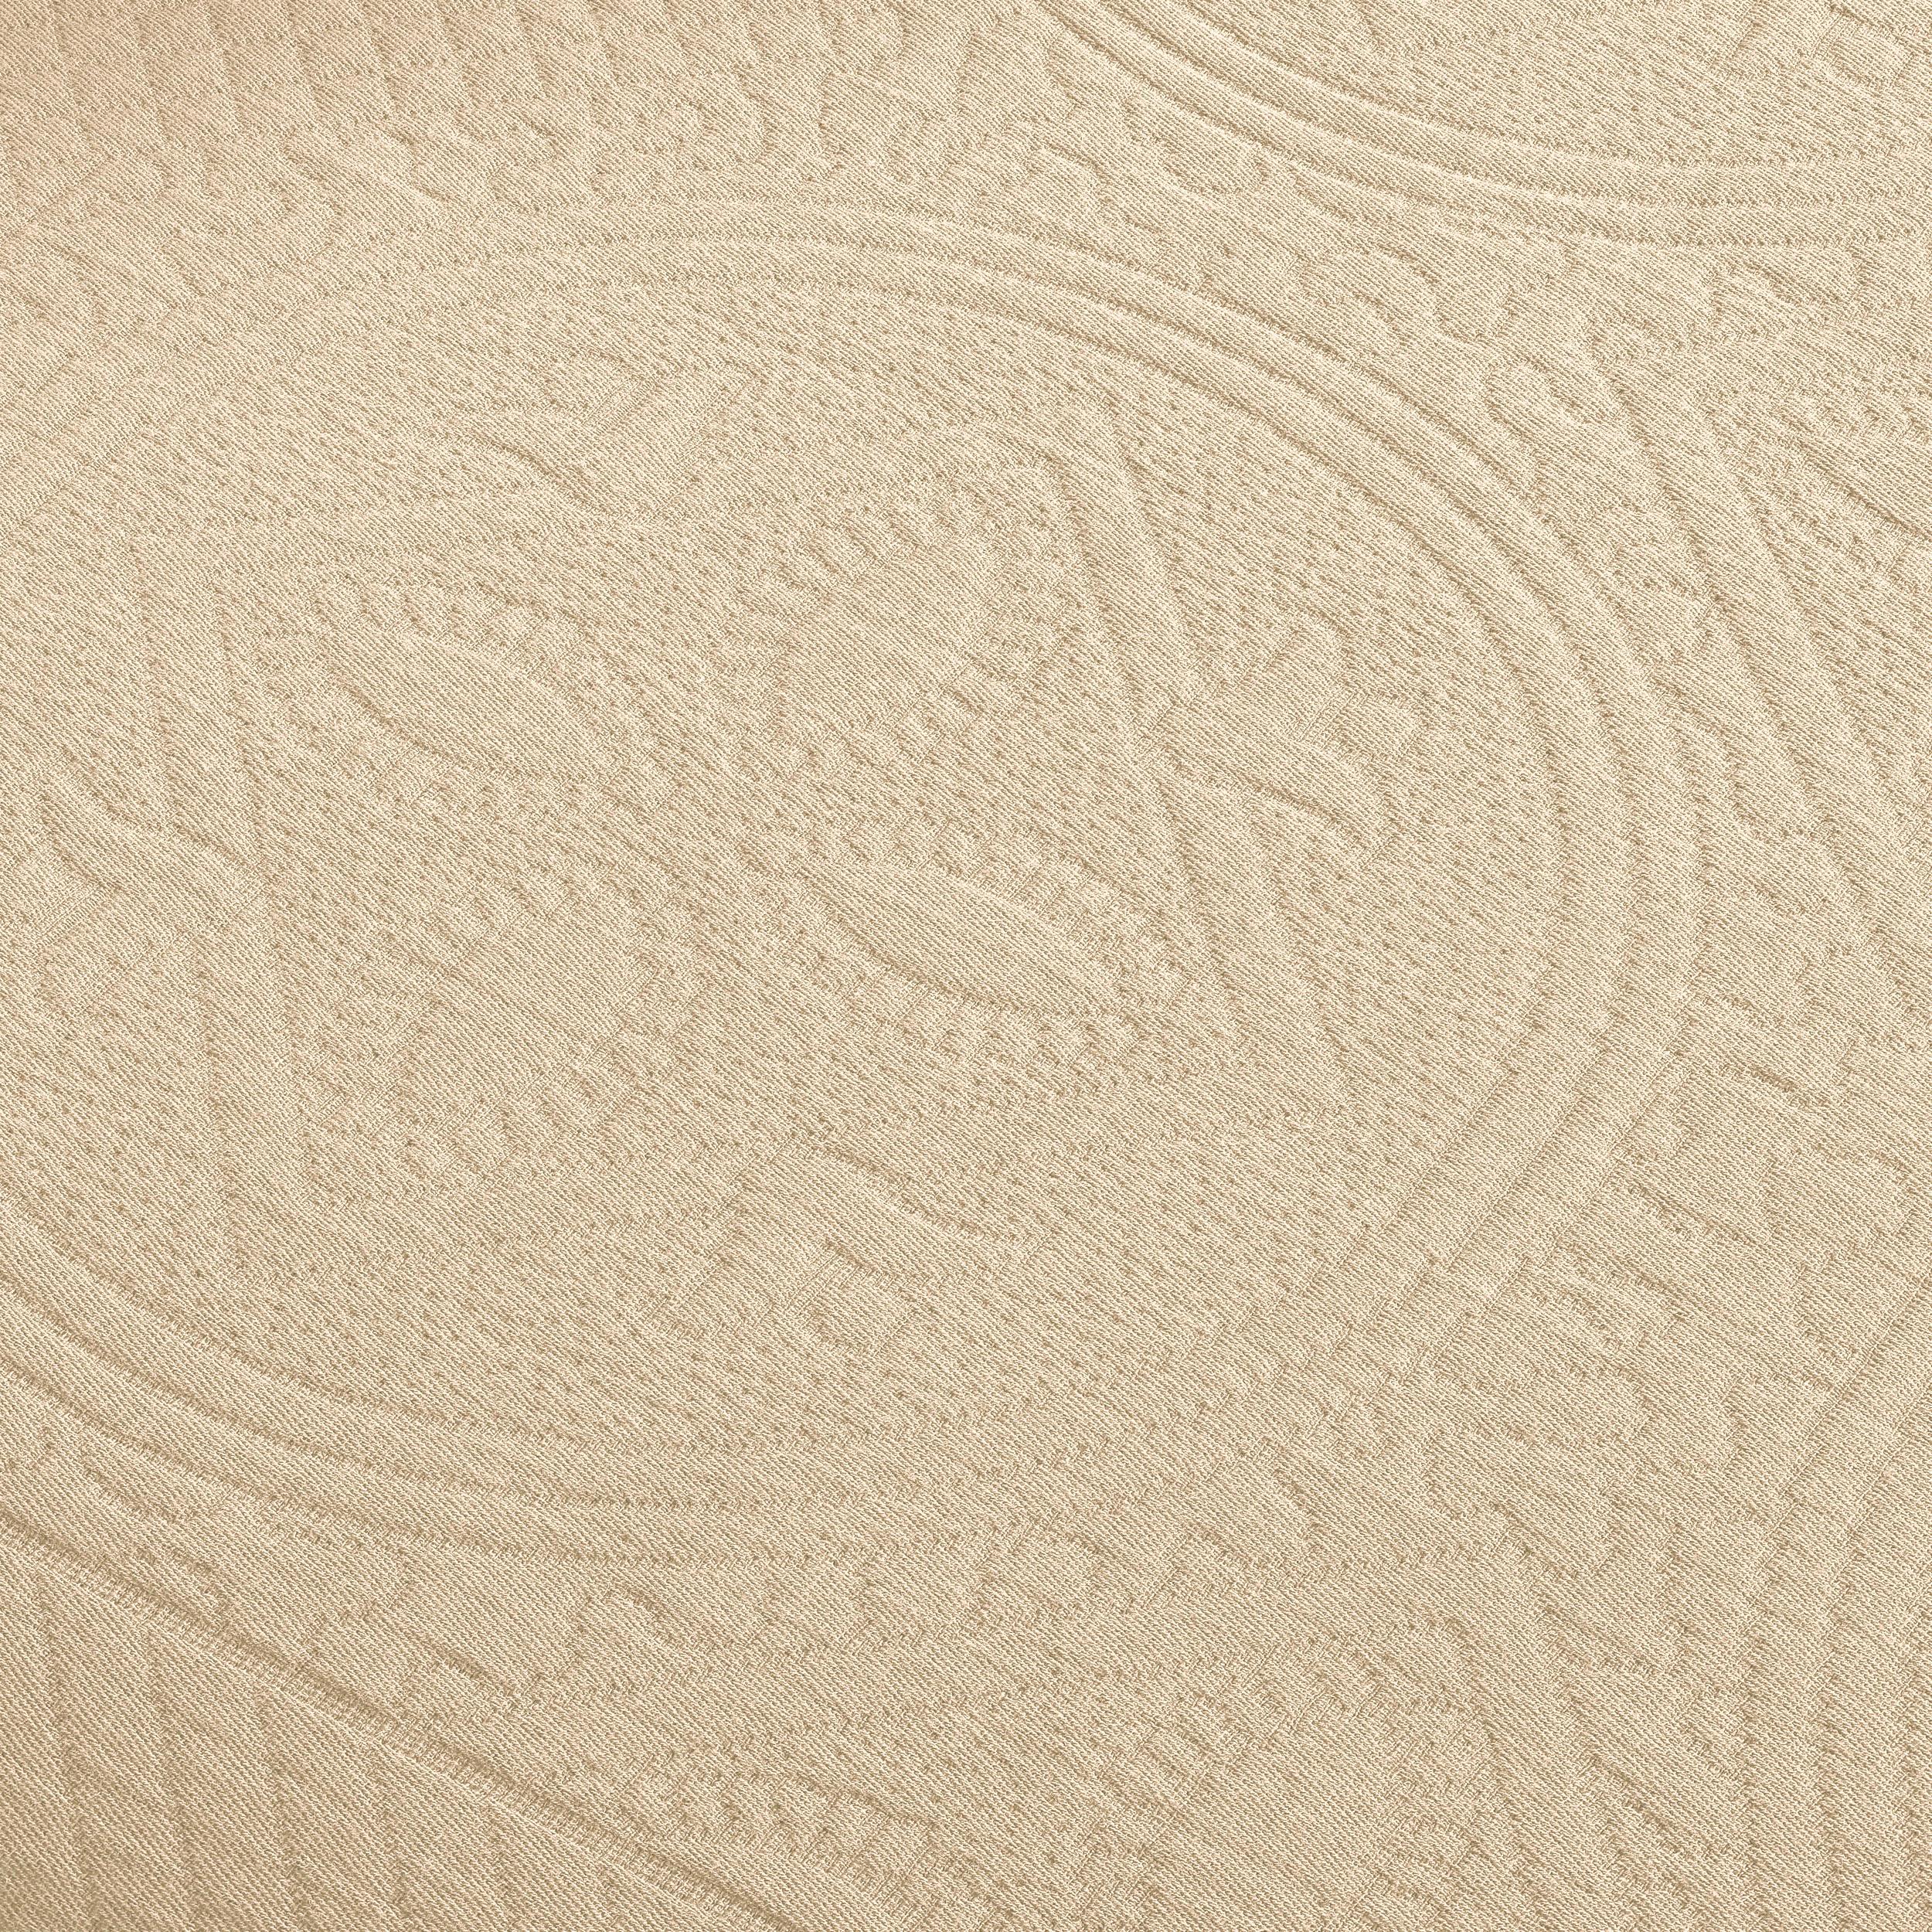 Celtic-Circle-Cotton-Jacquard-Matelasse-Scalloped-Bedspread-Set thumbnail 17